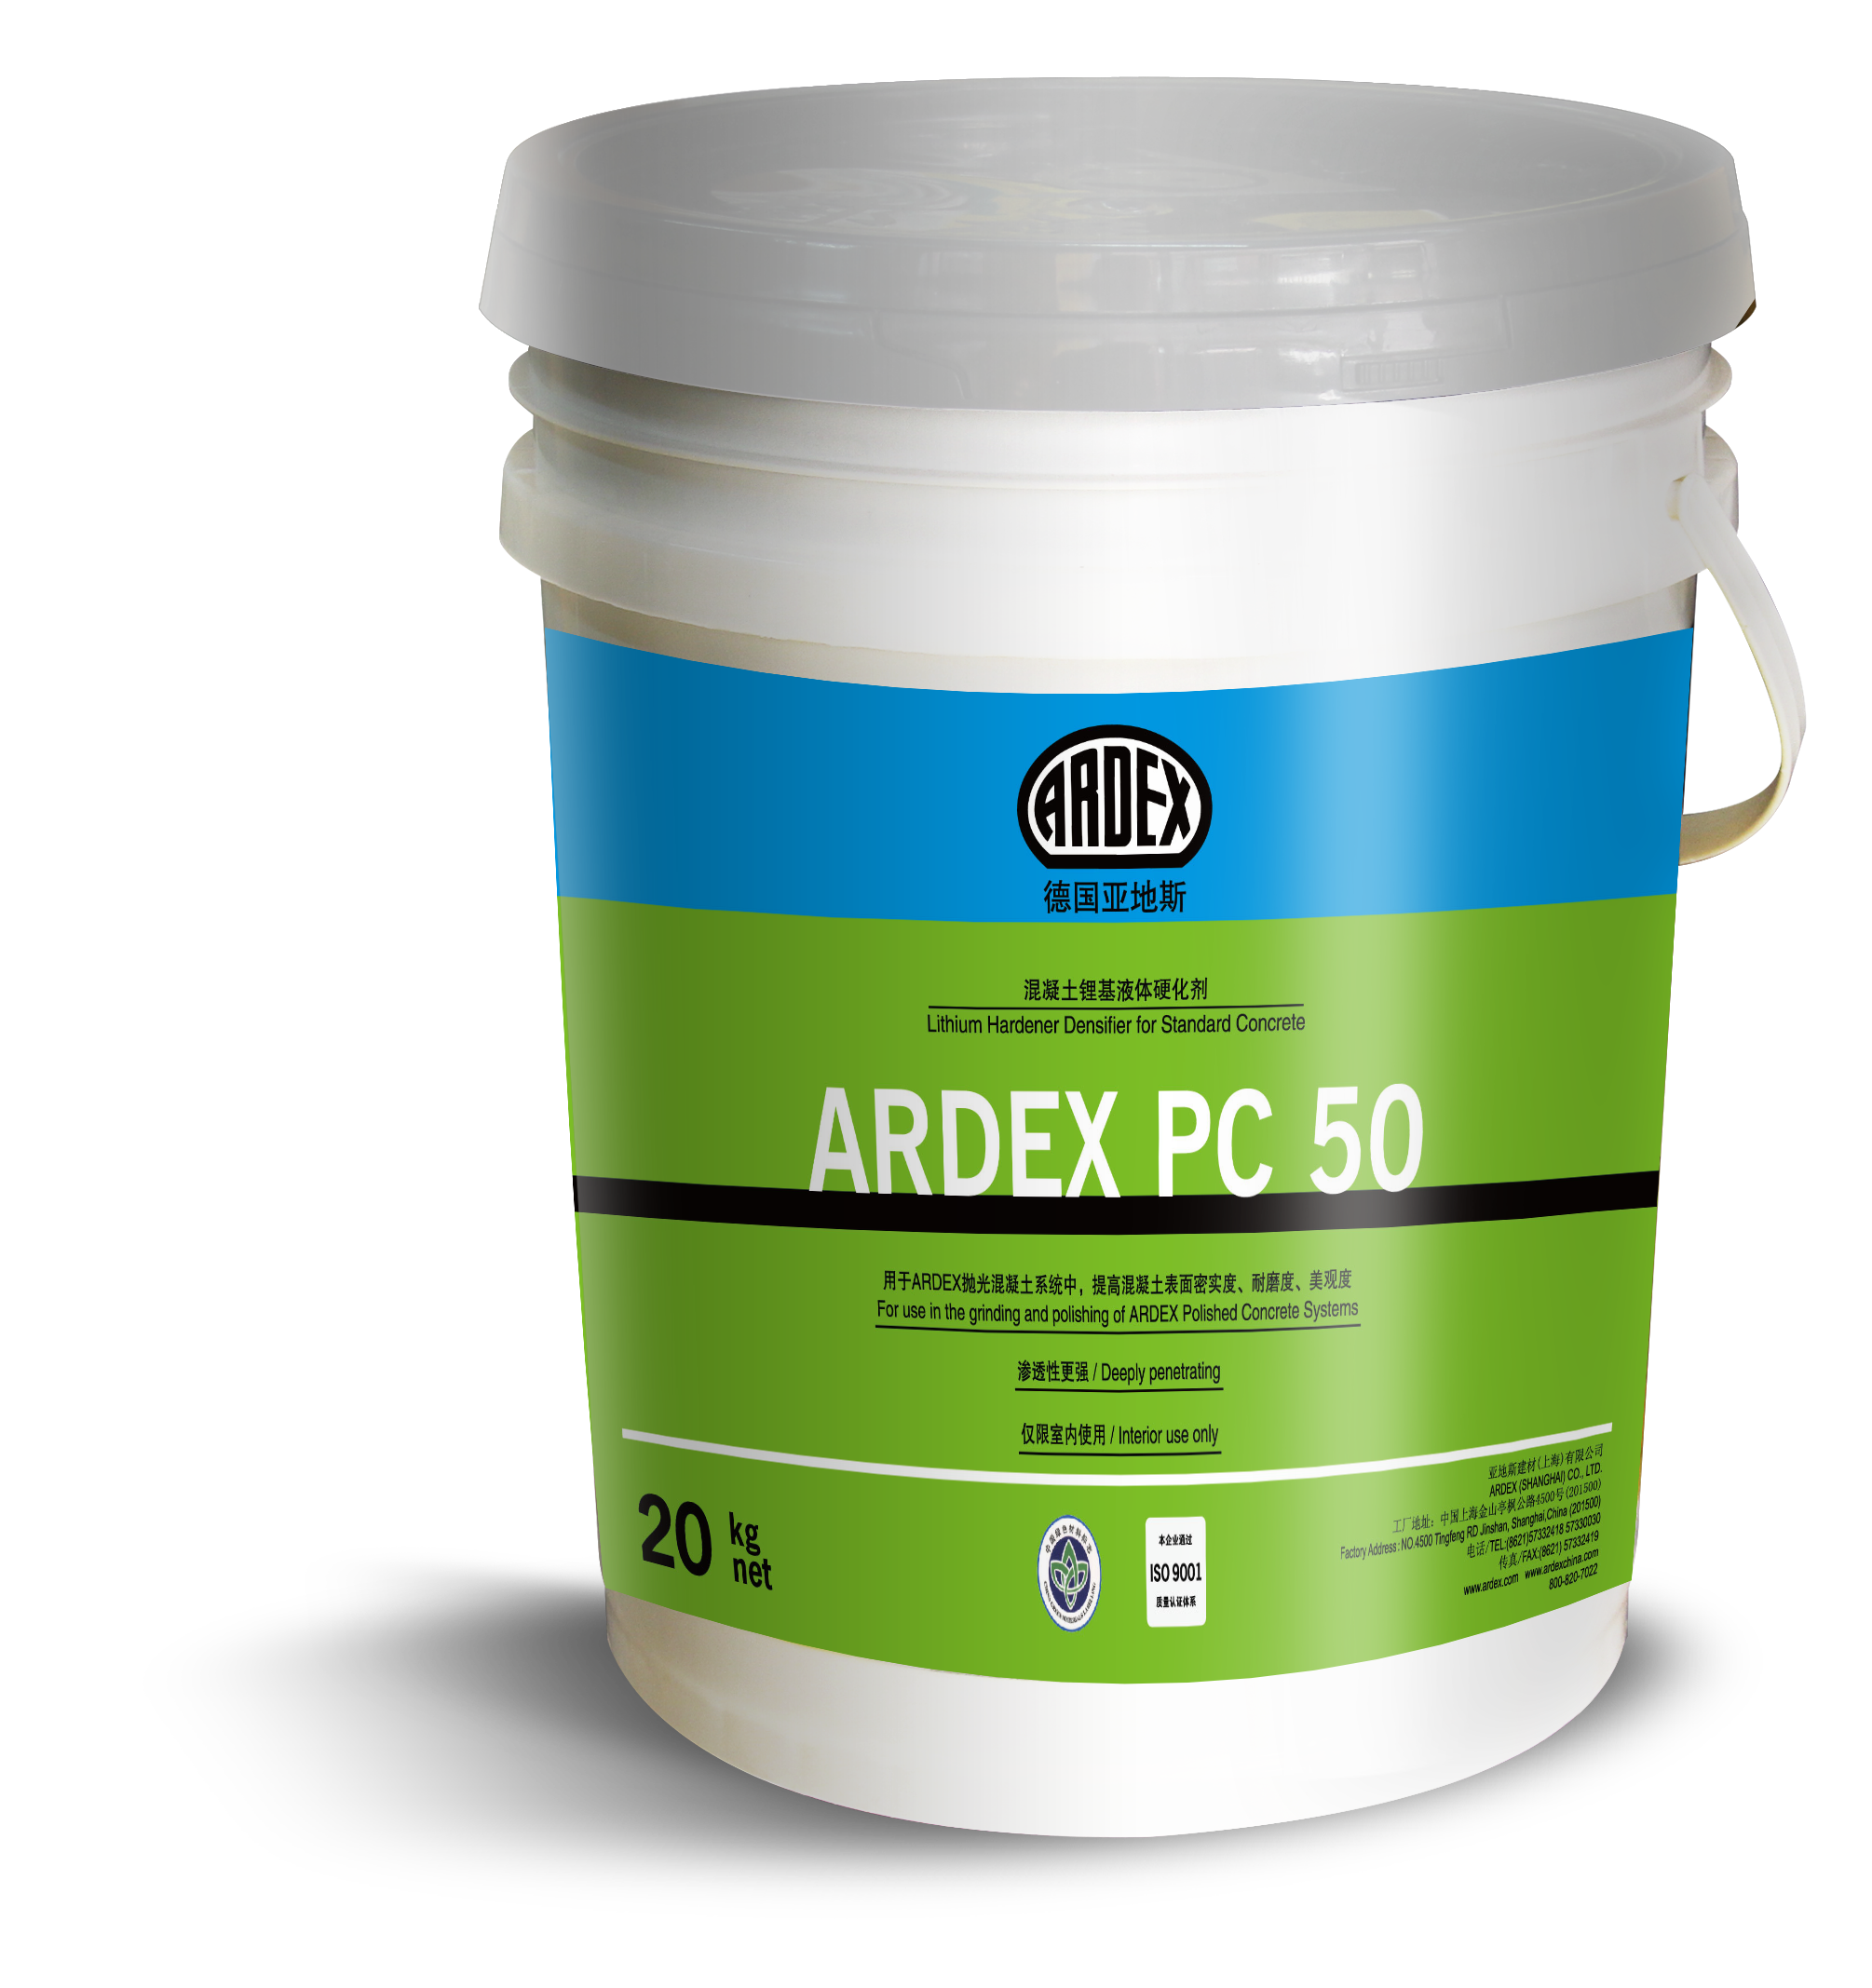 ARDEX PC 50